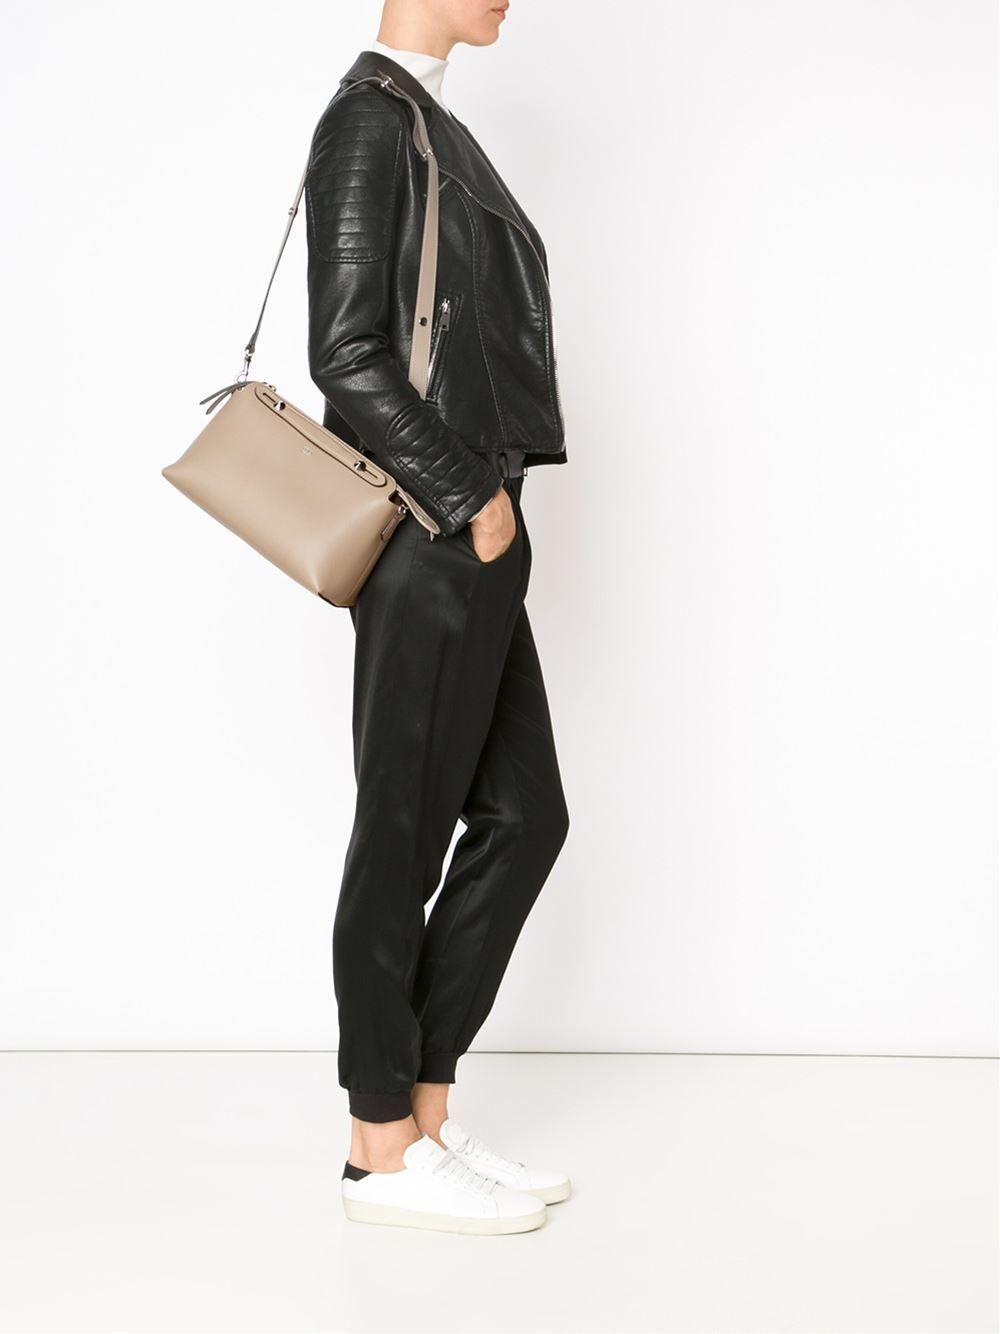 b7a2a9b229 fendi #bytheway #boston #beige #women #fashion #style www.jofre.eu ...